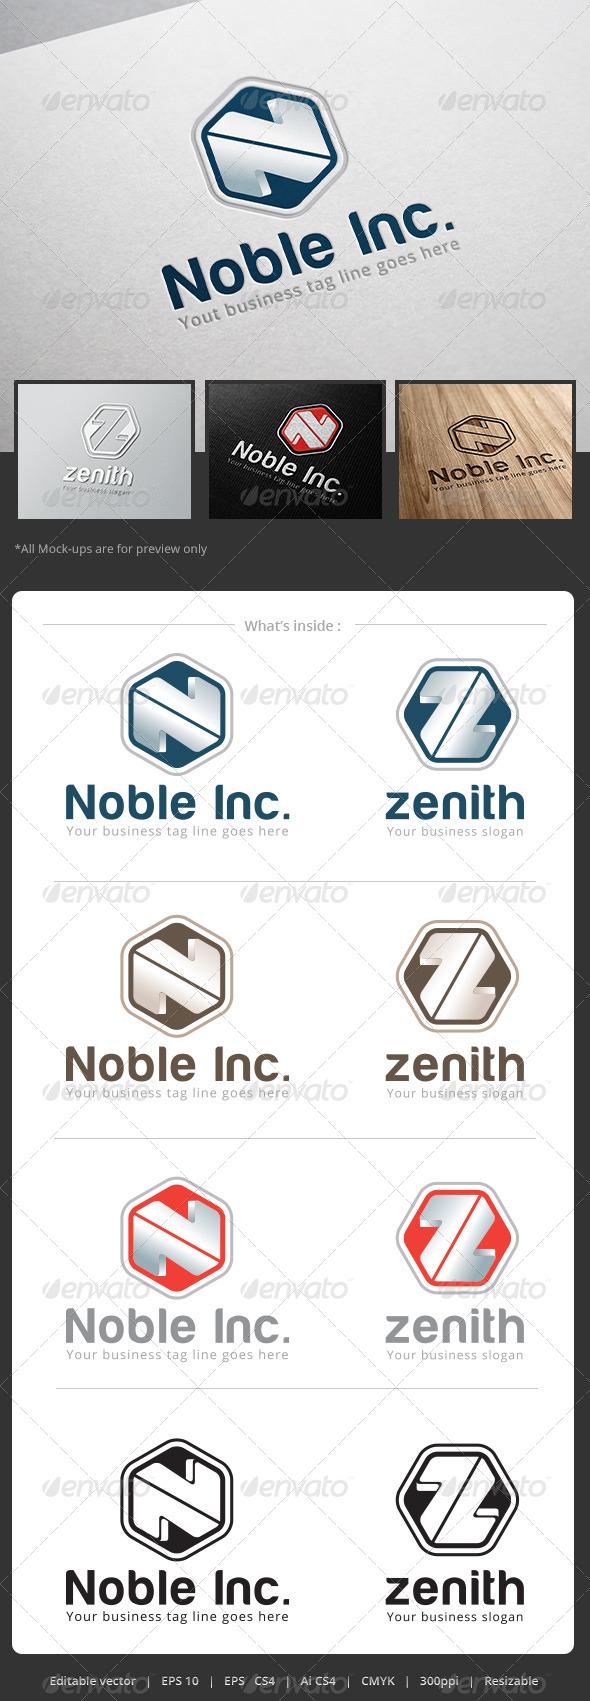 GraphicRiver Noble Inc Logo 5319621